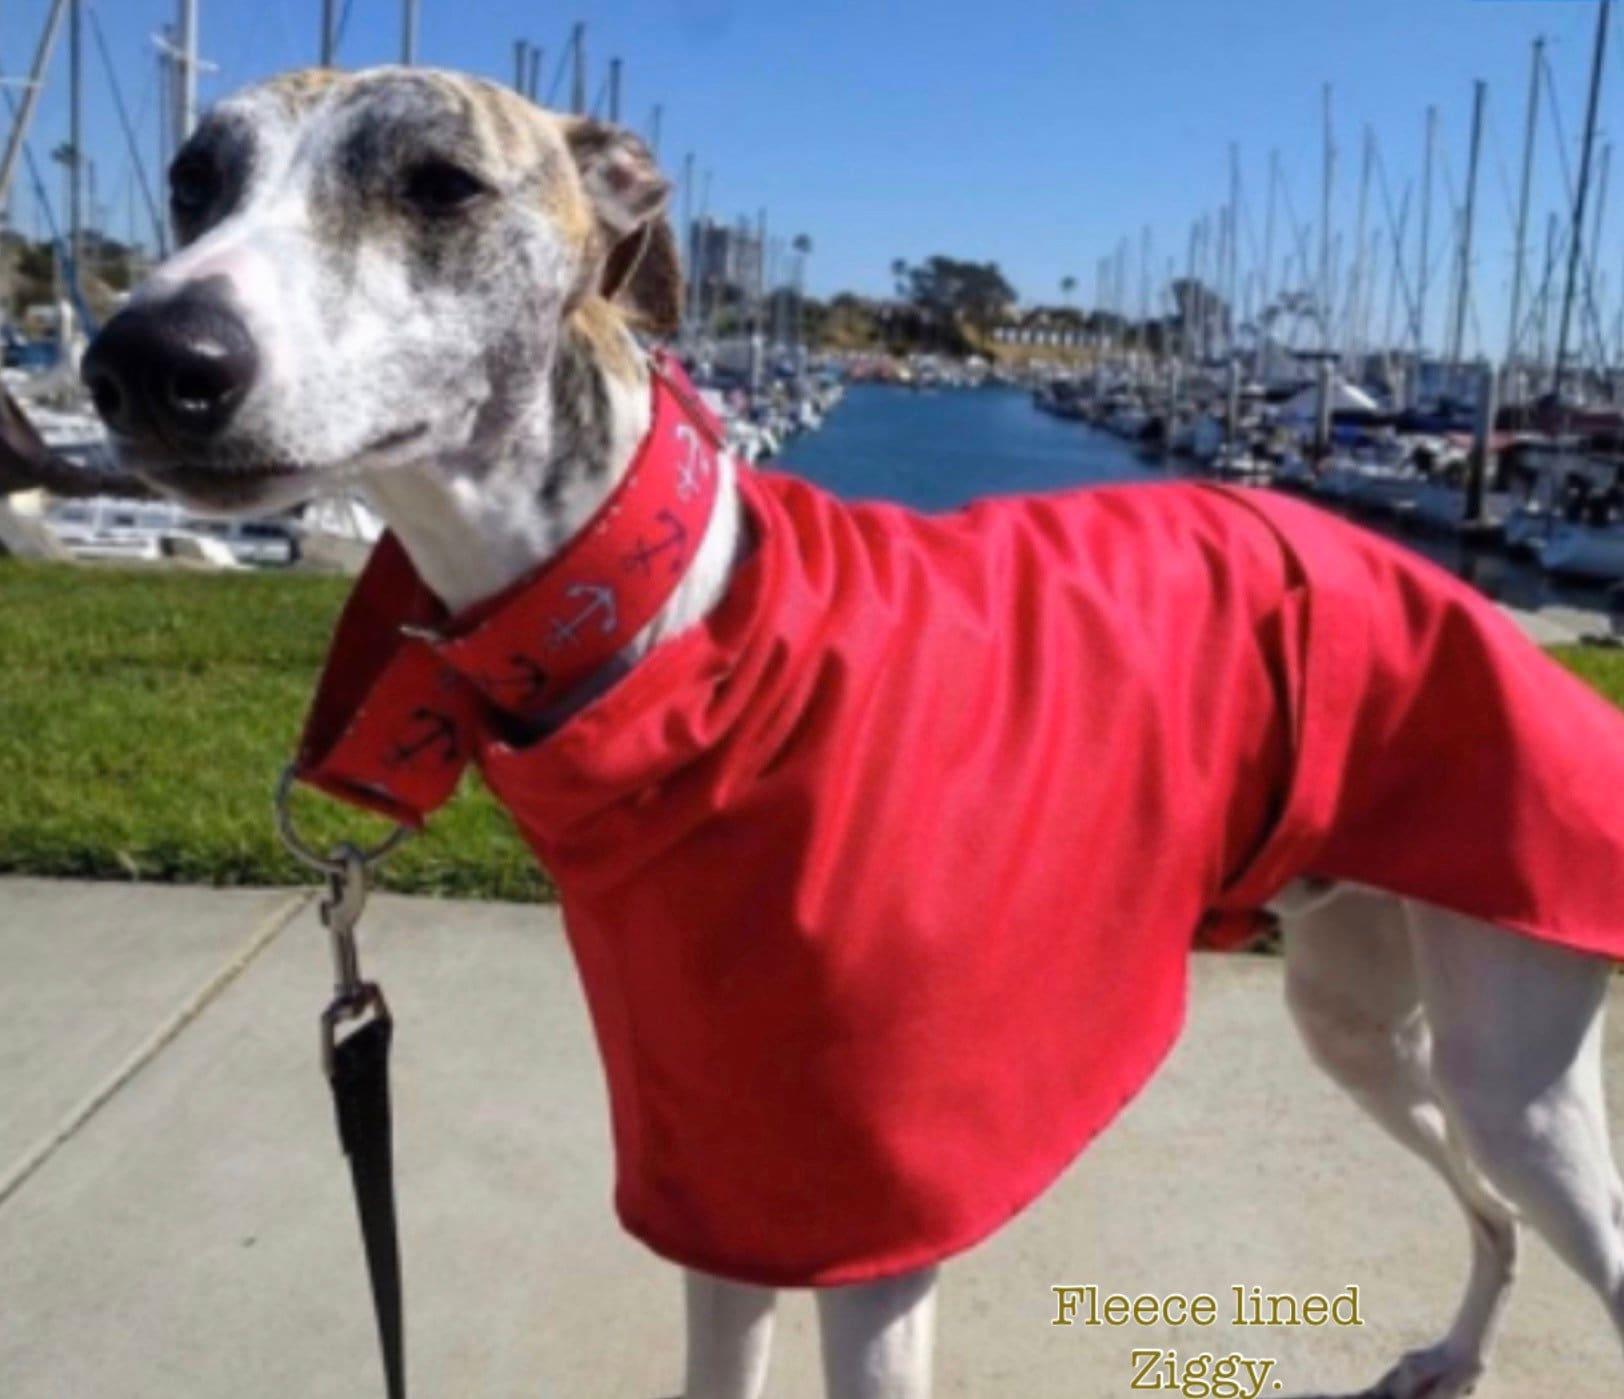 BlueGum Design Grey or Black Polar Fleece Lining Greyhound Raincoat Blue Diamond Pattern Waterproof Ripstop